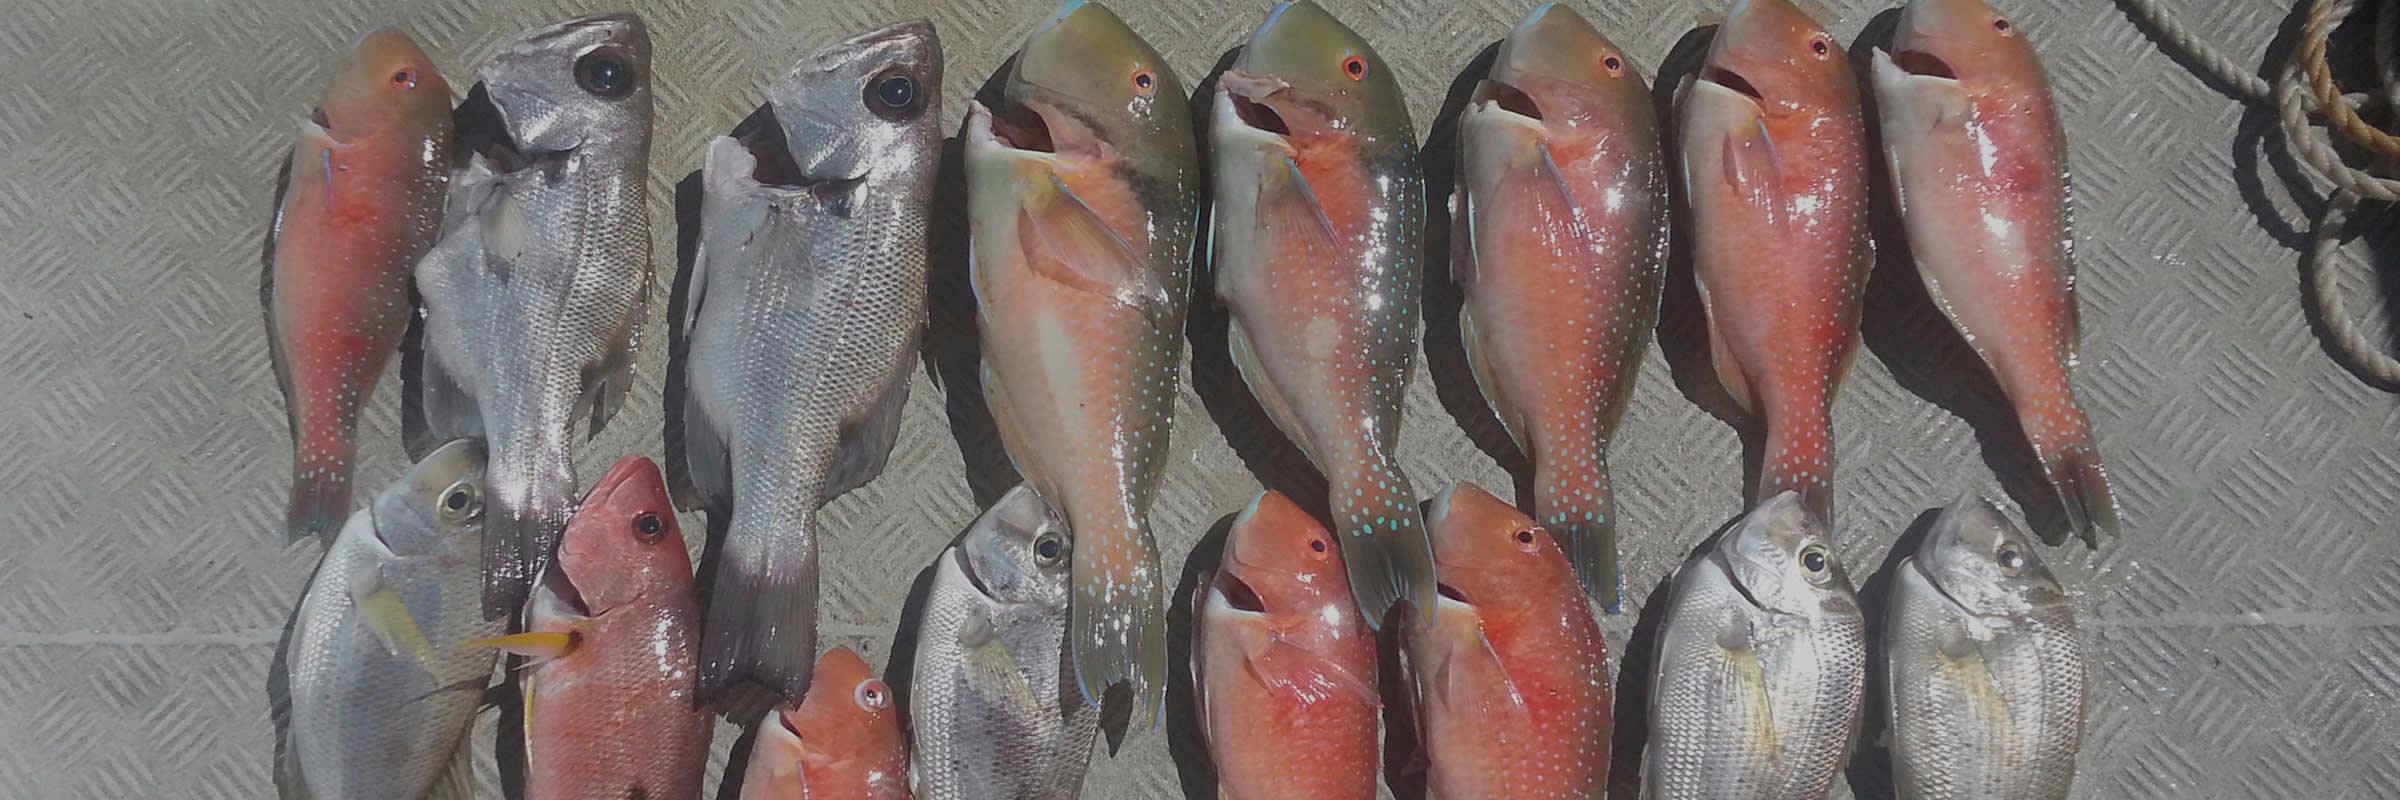 Mooloolaba Fishing Charters